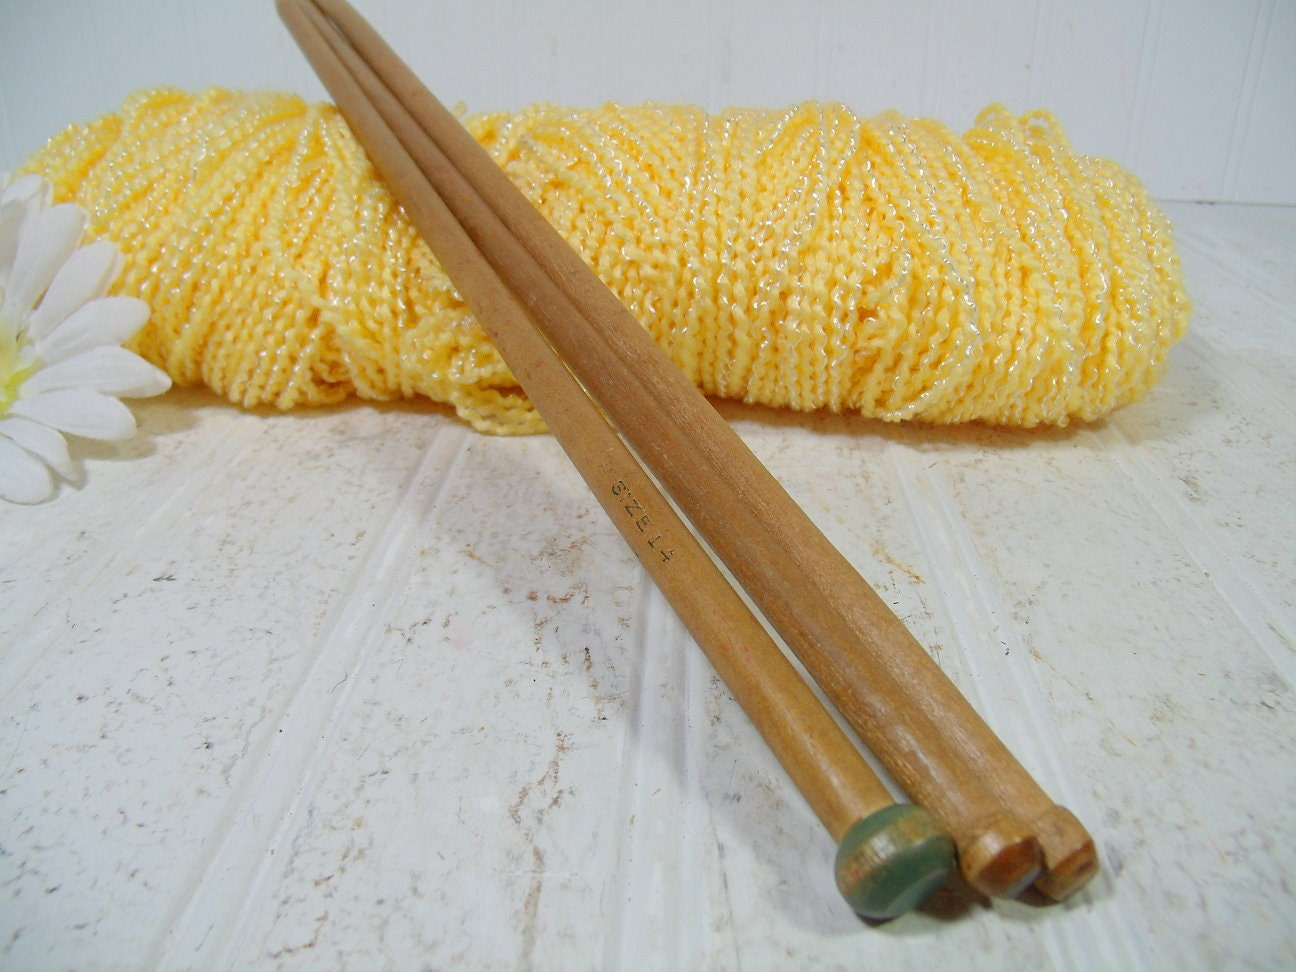 Vintage Knitting Needles : Vintage wooden large knitting needles trio collection retro